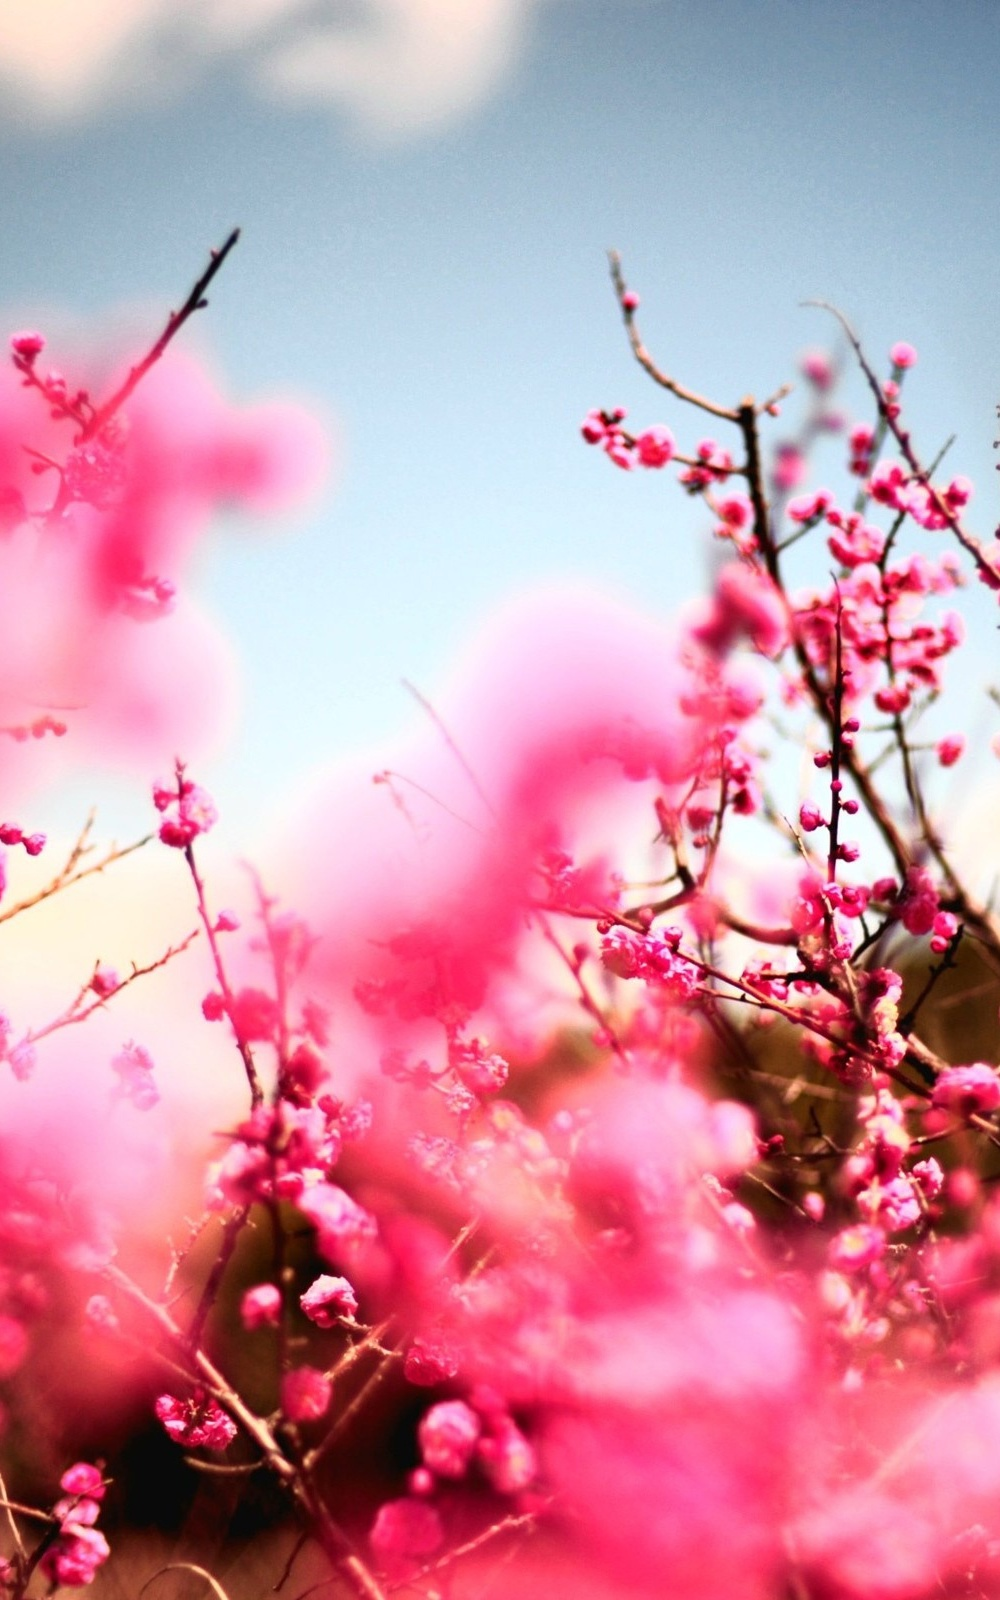 Pink Cherry Blossom Wallpaper - WallpaperSafari